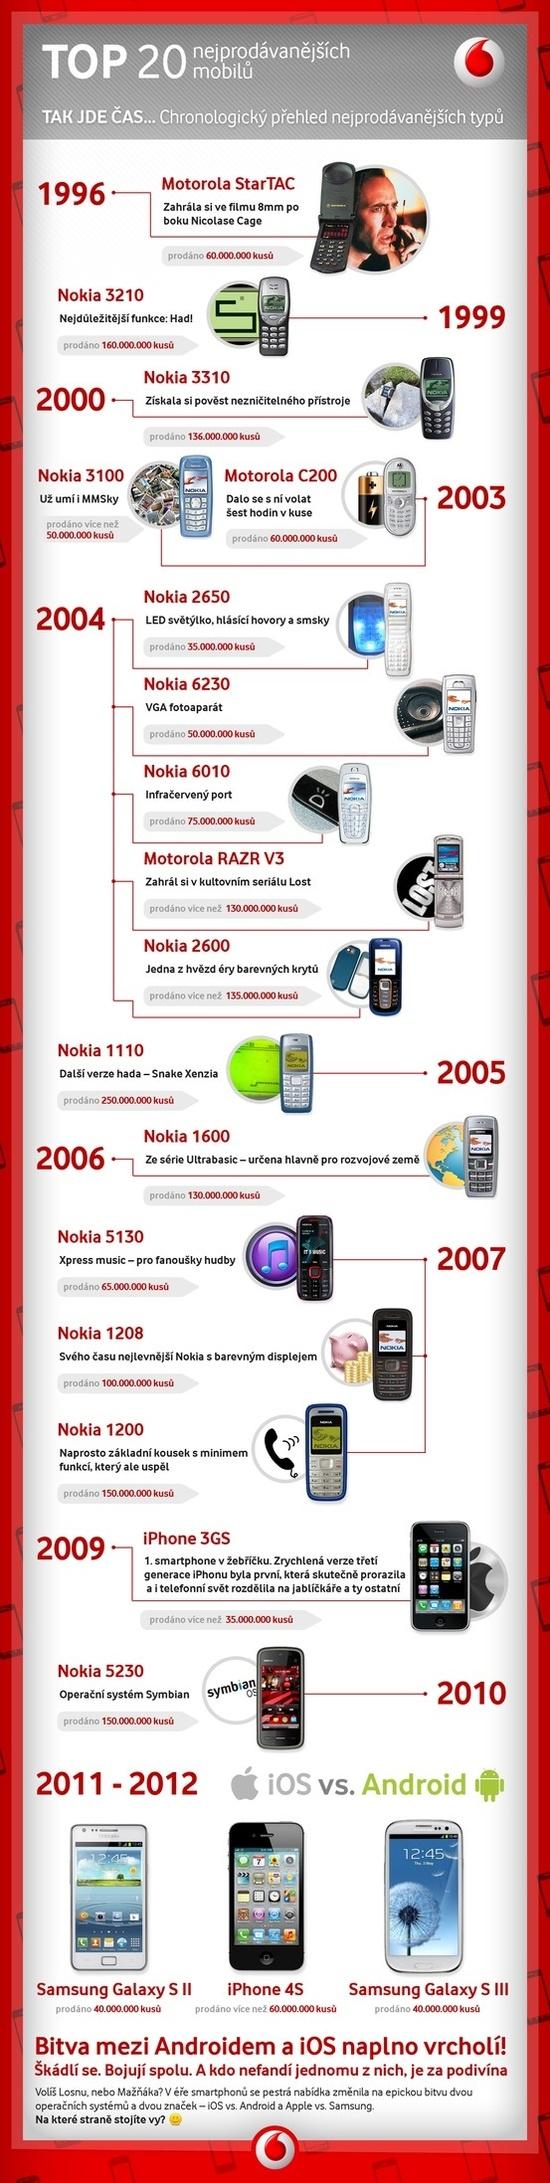 20 nejprodavanejsich mobilu